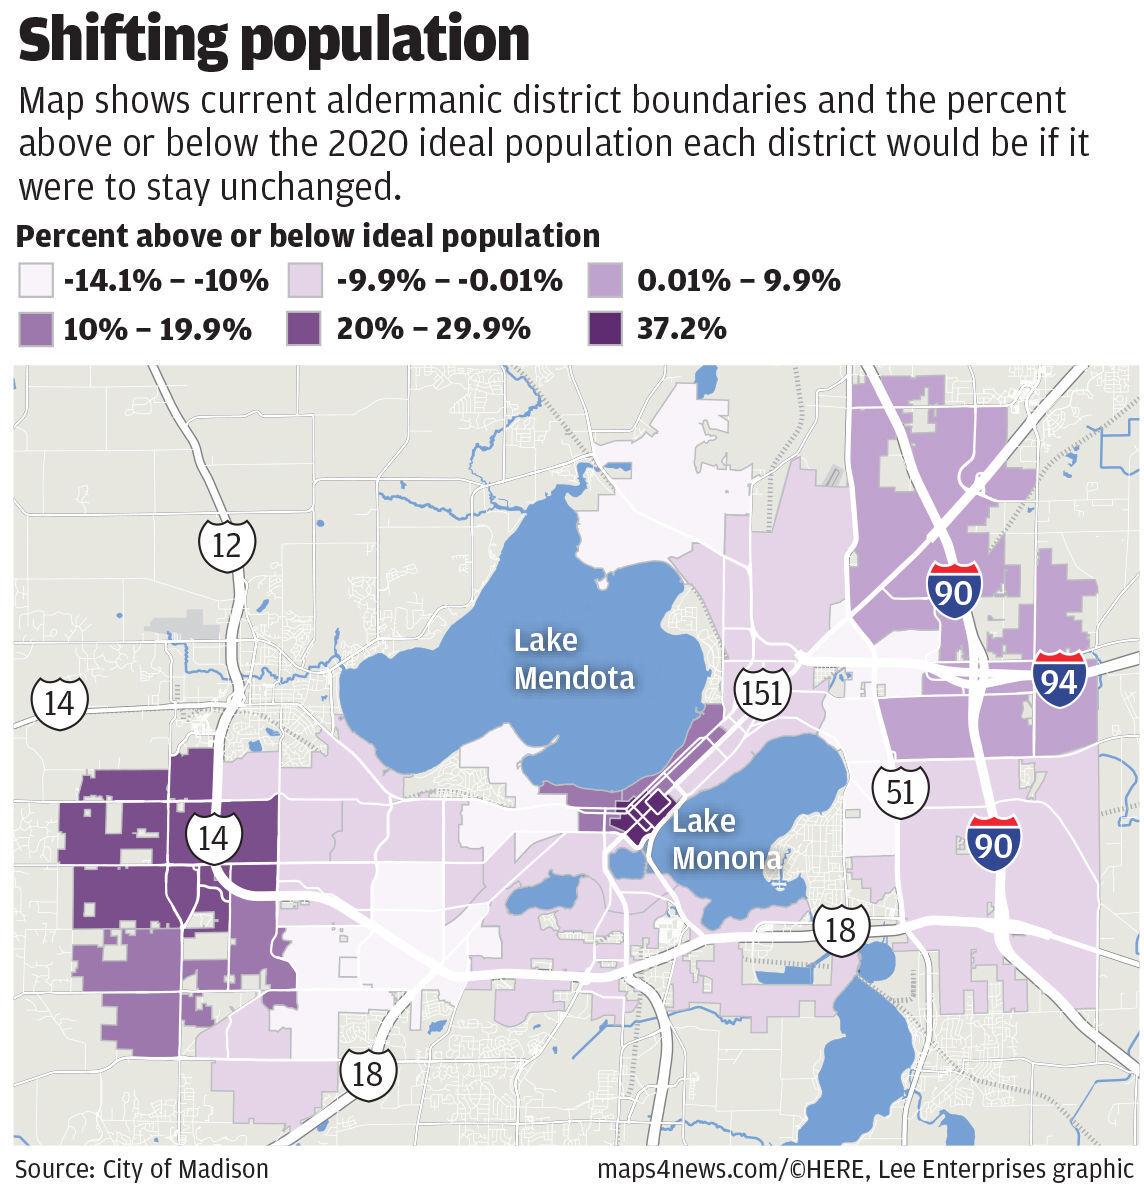 Shifting population